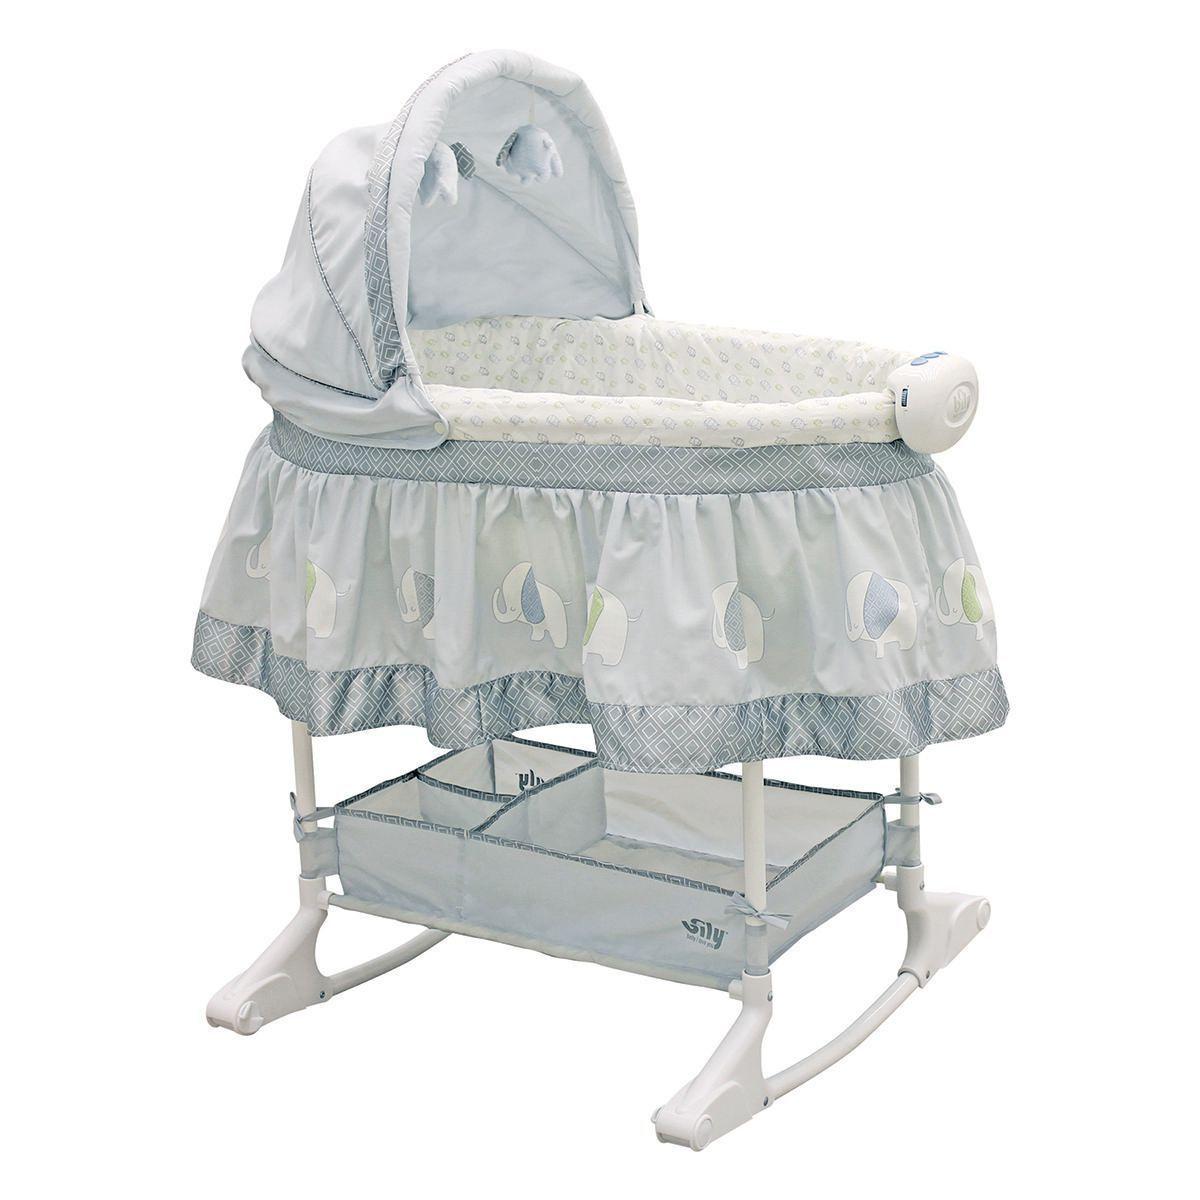 Walmart Canada Bassinet Bassinet Mattress Baby Bassinet